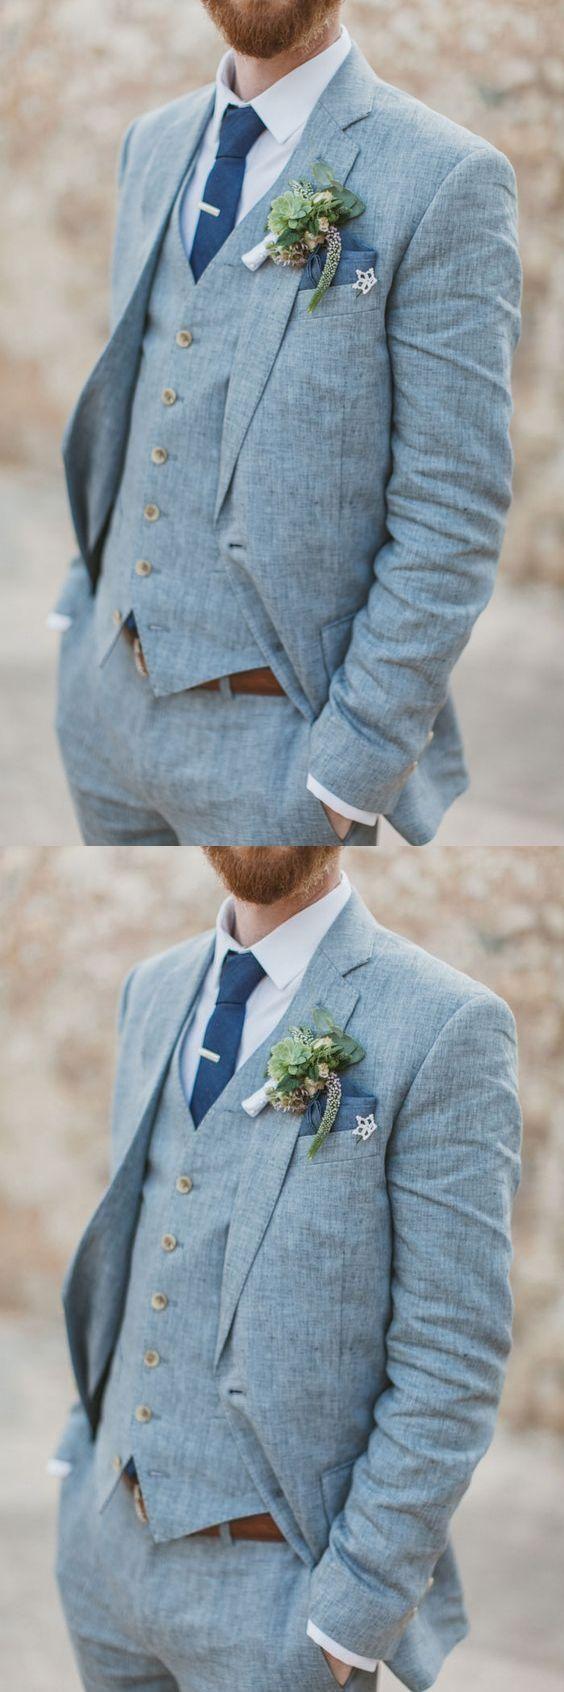 Light Blue Linen Men Suits For Beach Wedding 3 Piece Groom Tuxedos ...